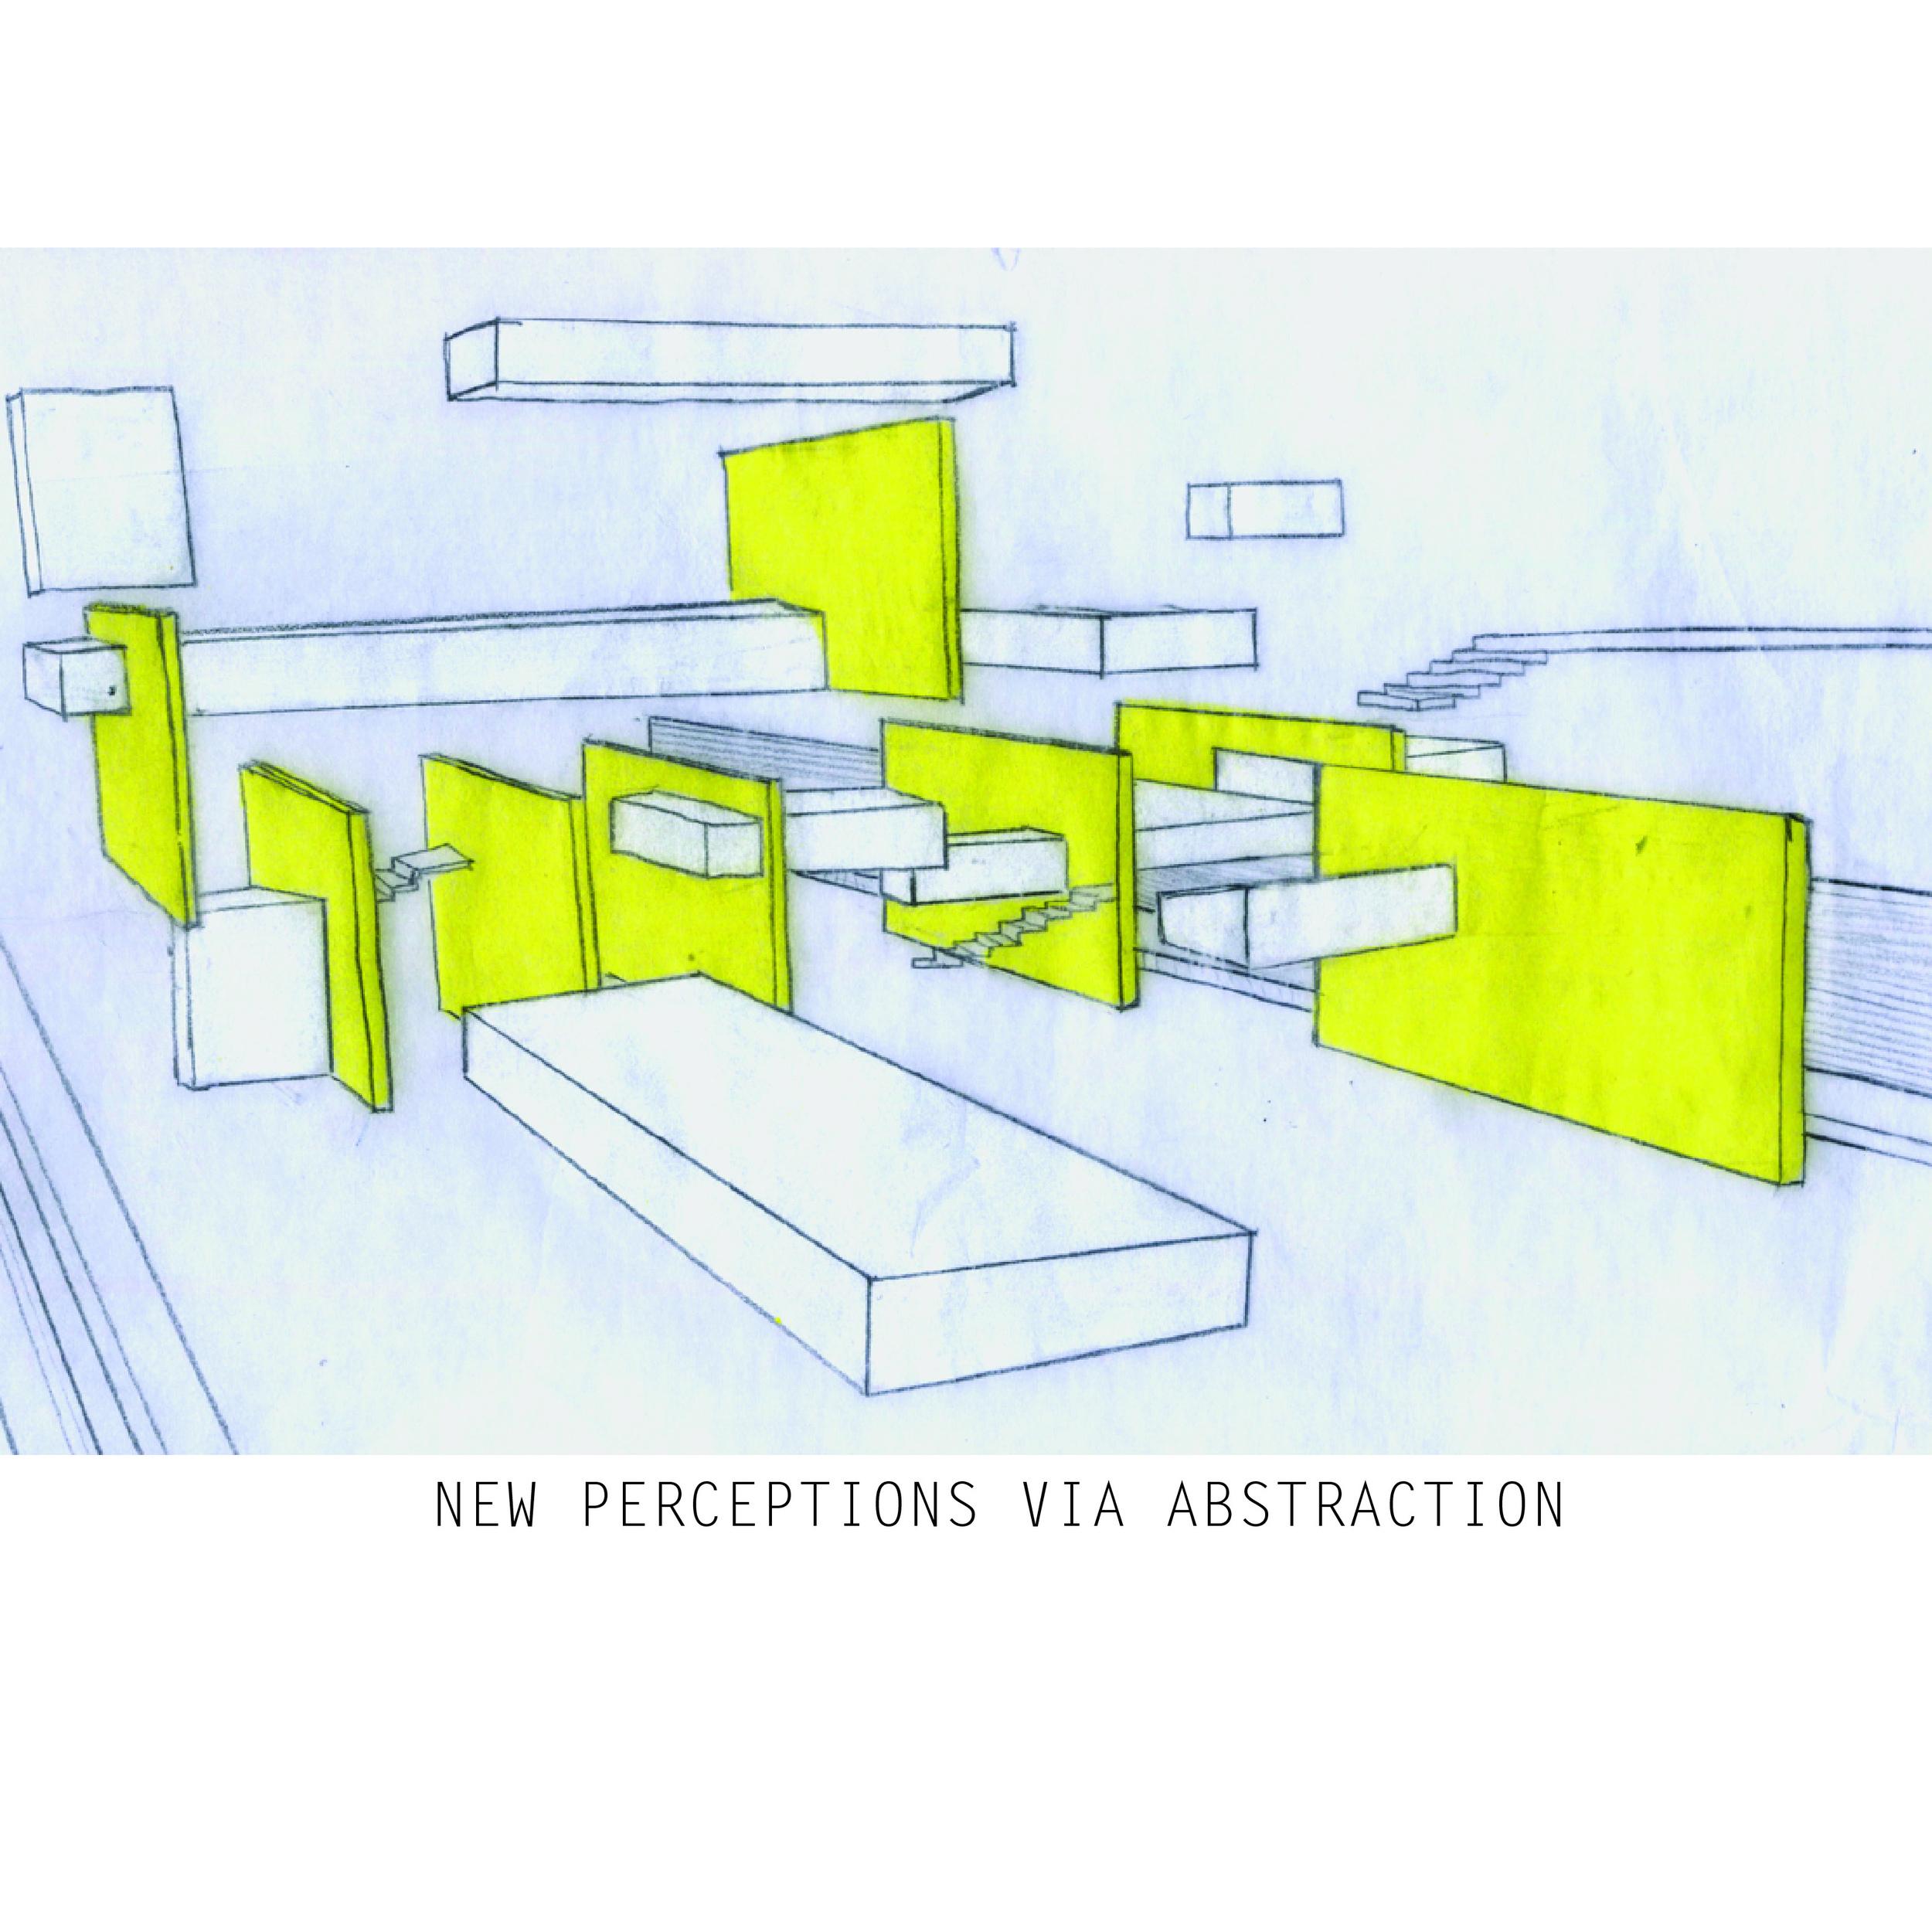 conceptual image: abstraction via explosion